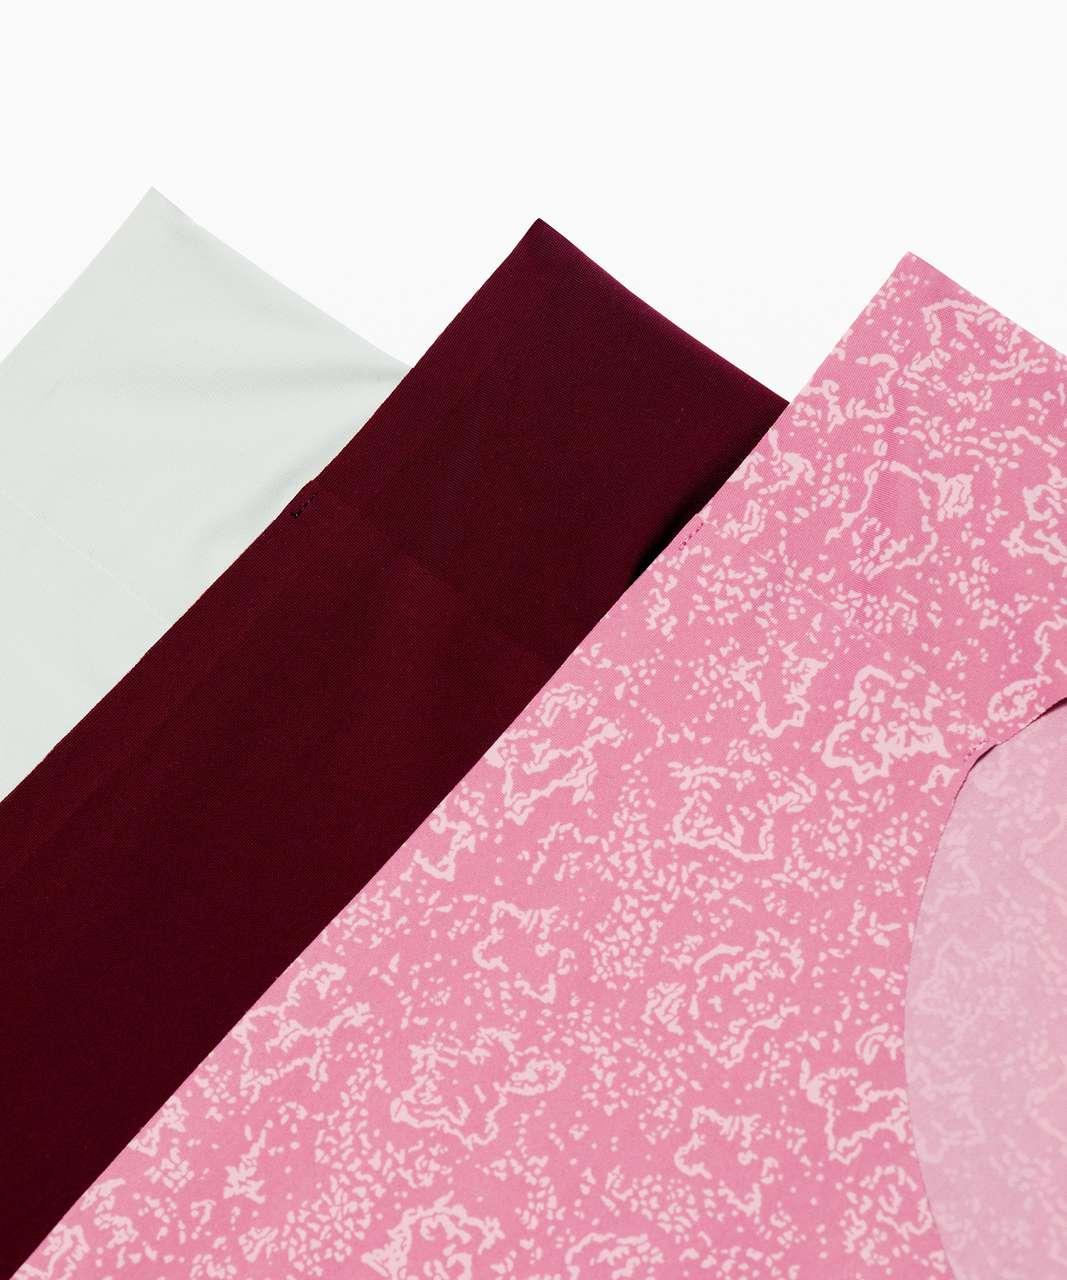 Lululemon Namastay Put Hipster 3 Pack - Floral Stitch Pink Taupe Moss Rose / Garnet / Jade Grey